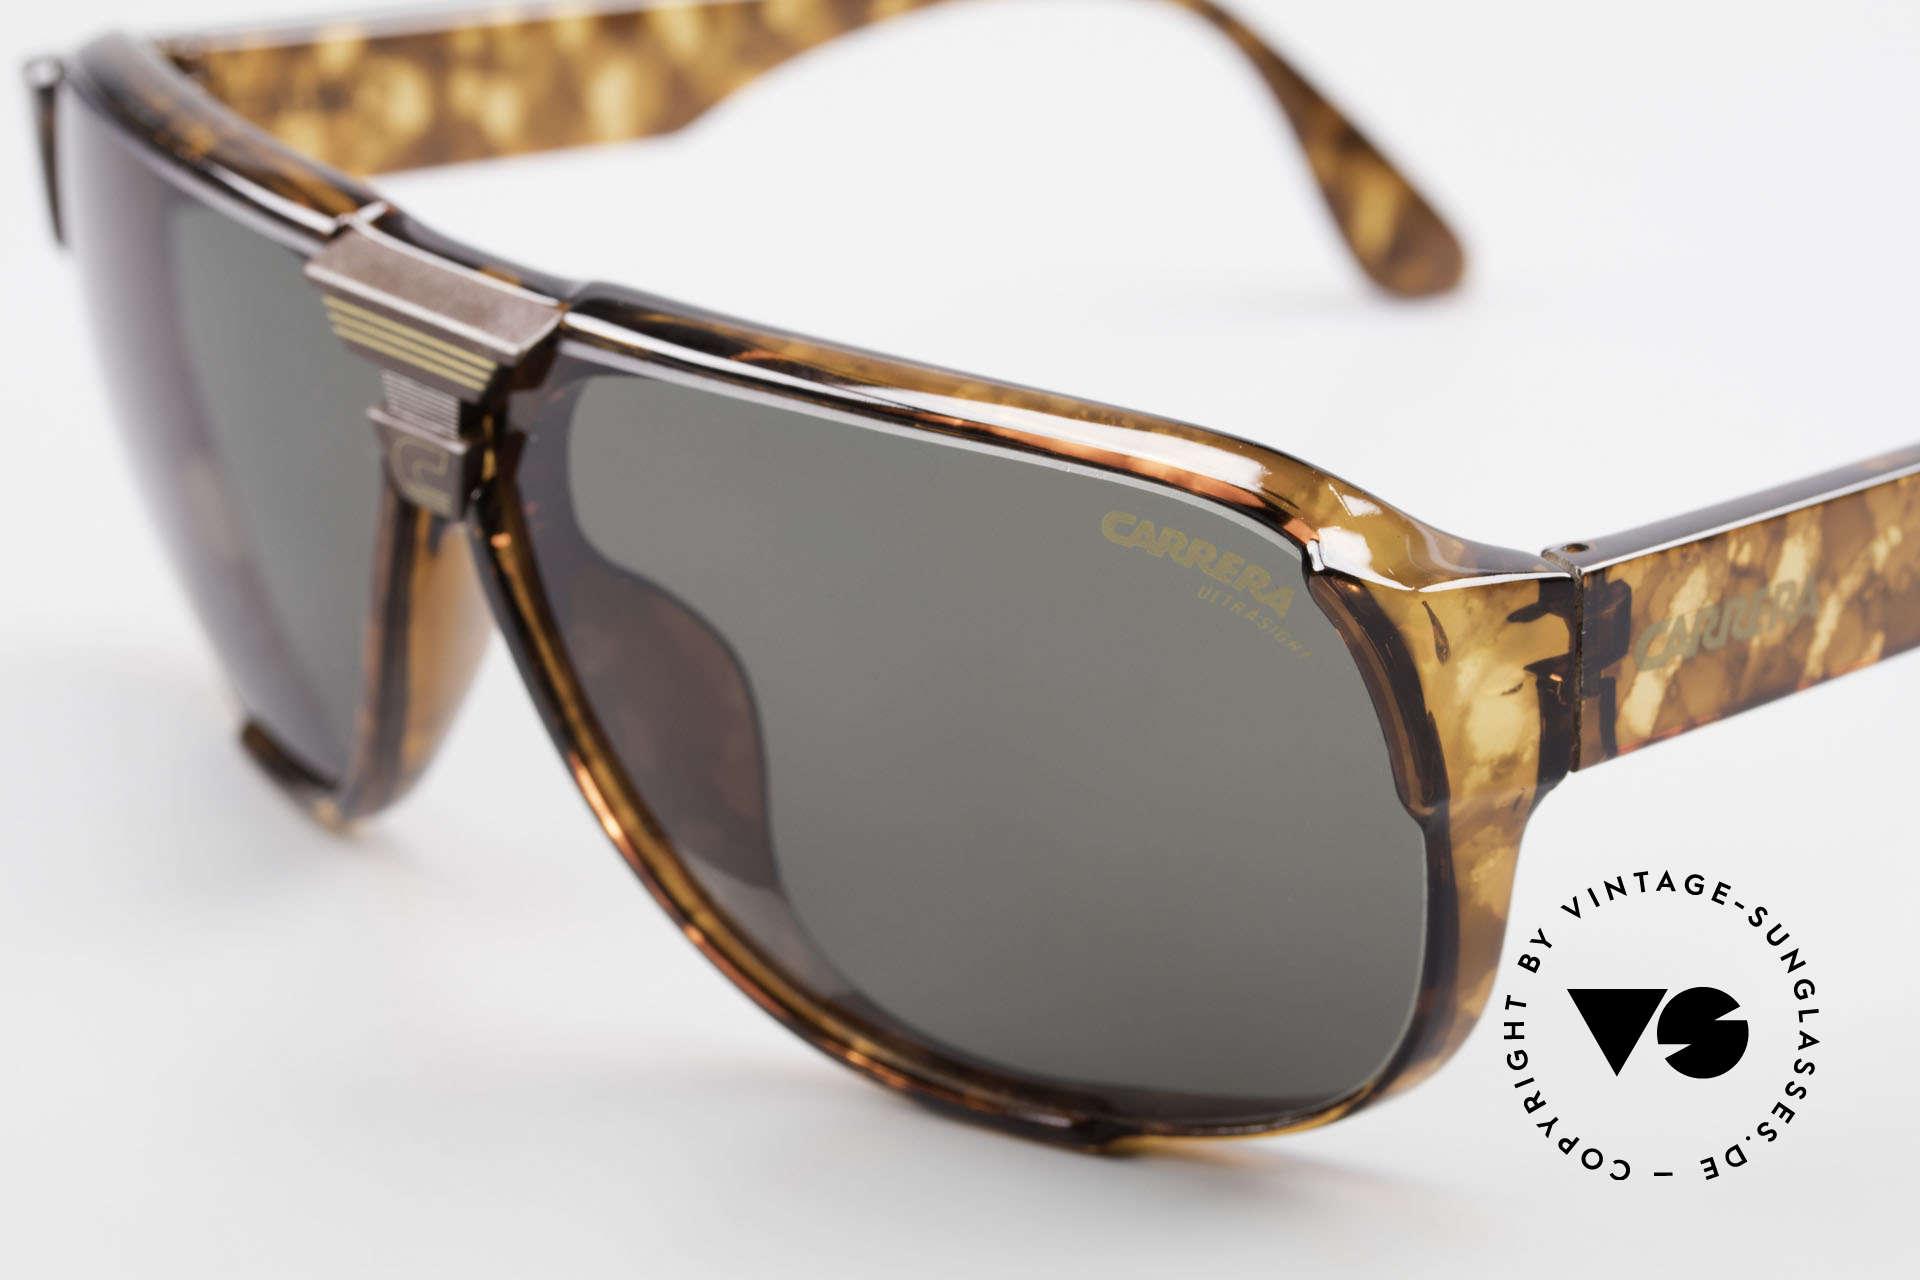 Carrera 5431 80's Alpine Changer Sunglasses, brown Ultrasight and green Ultrasight (100% UV), Made for Men